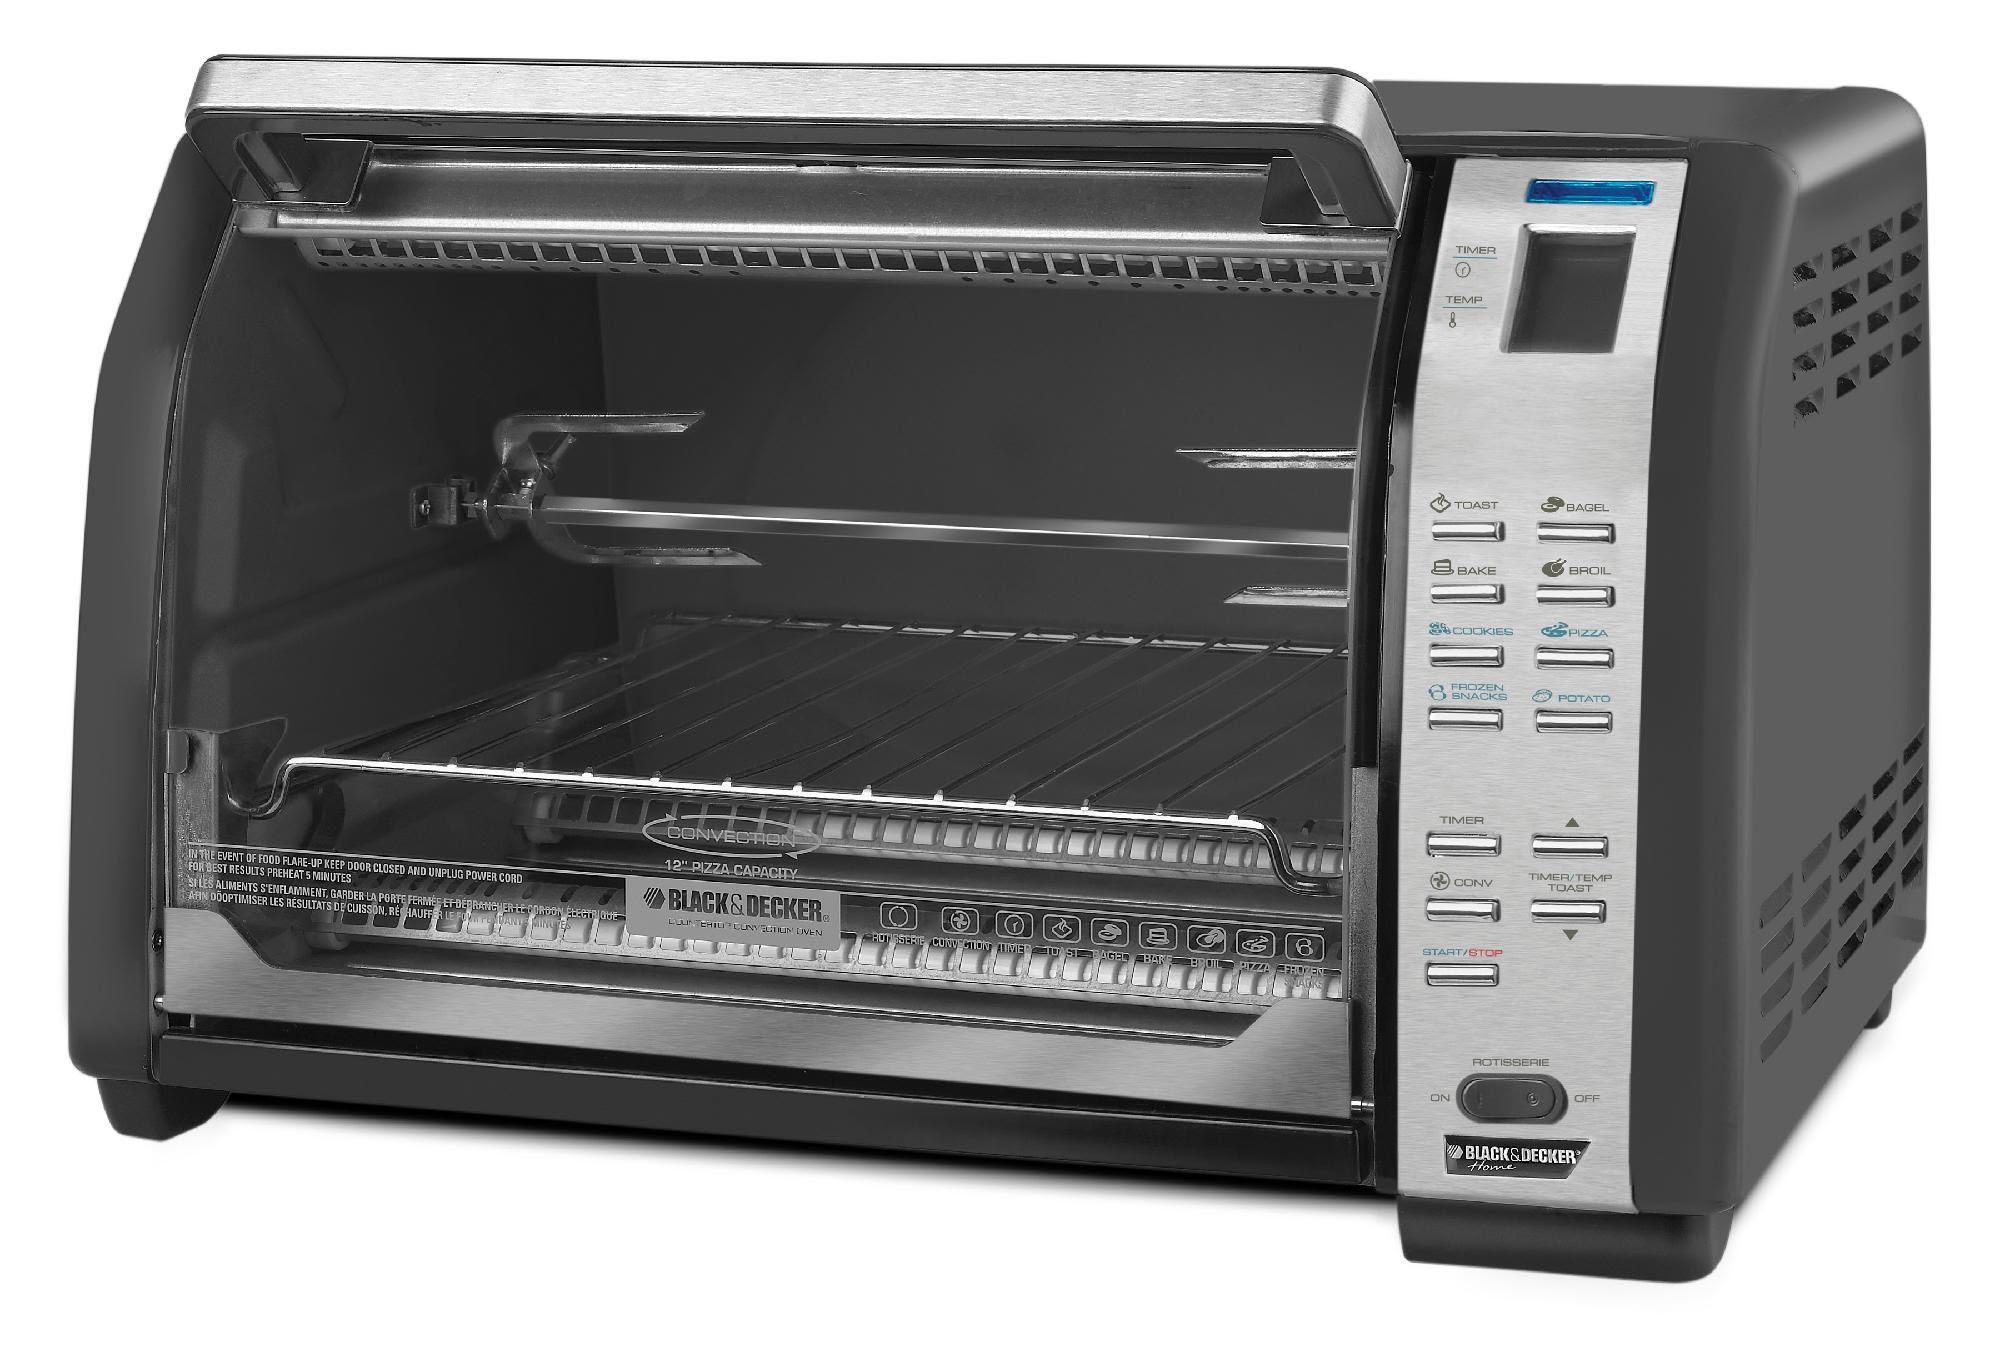 Applica Black & Decker CTO7100B 6-Slice Digital Rotisserie Convection Oven, Black - Appliances ...